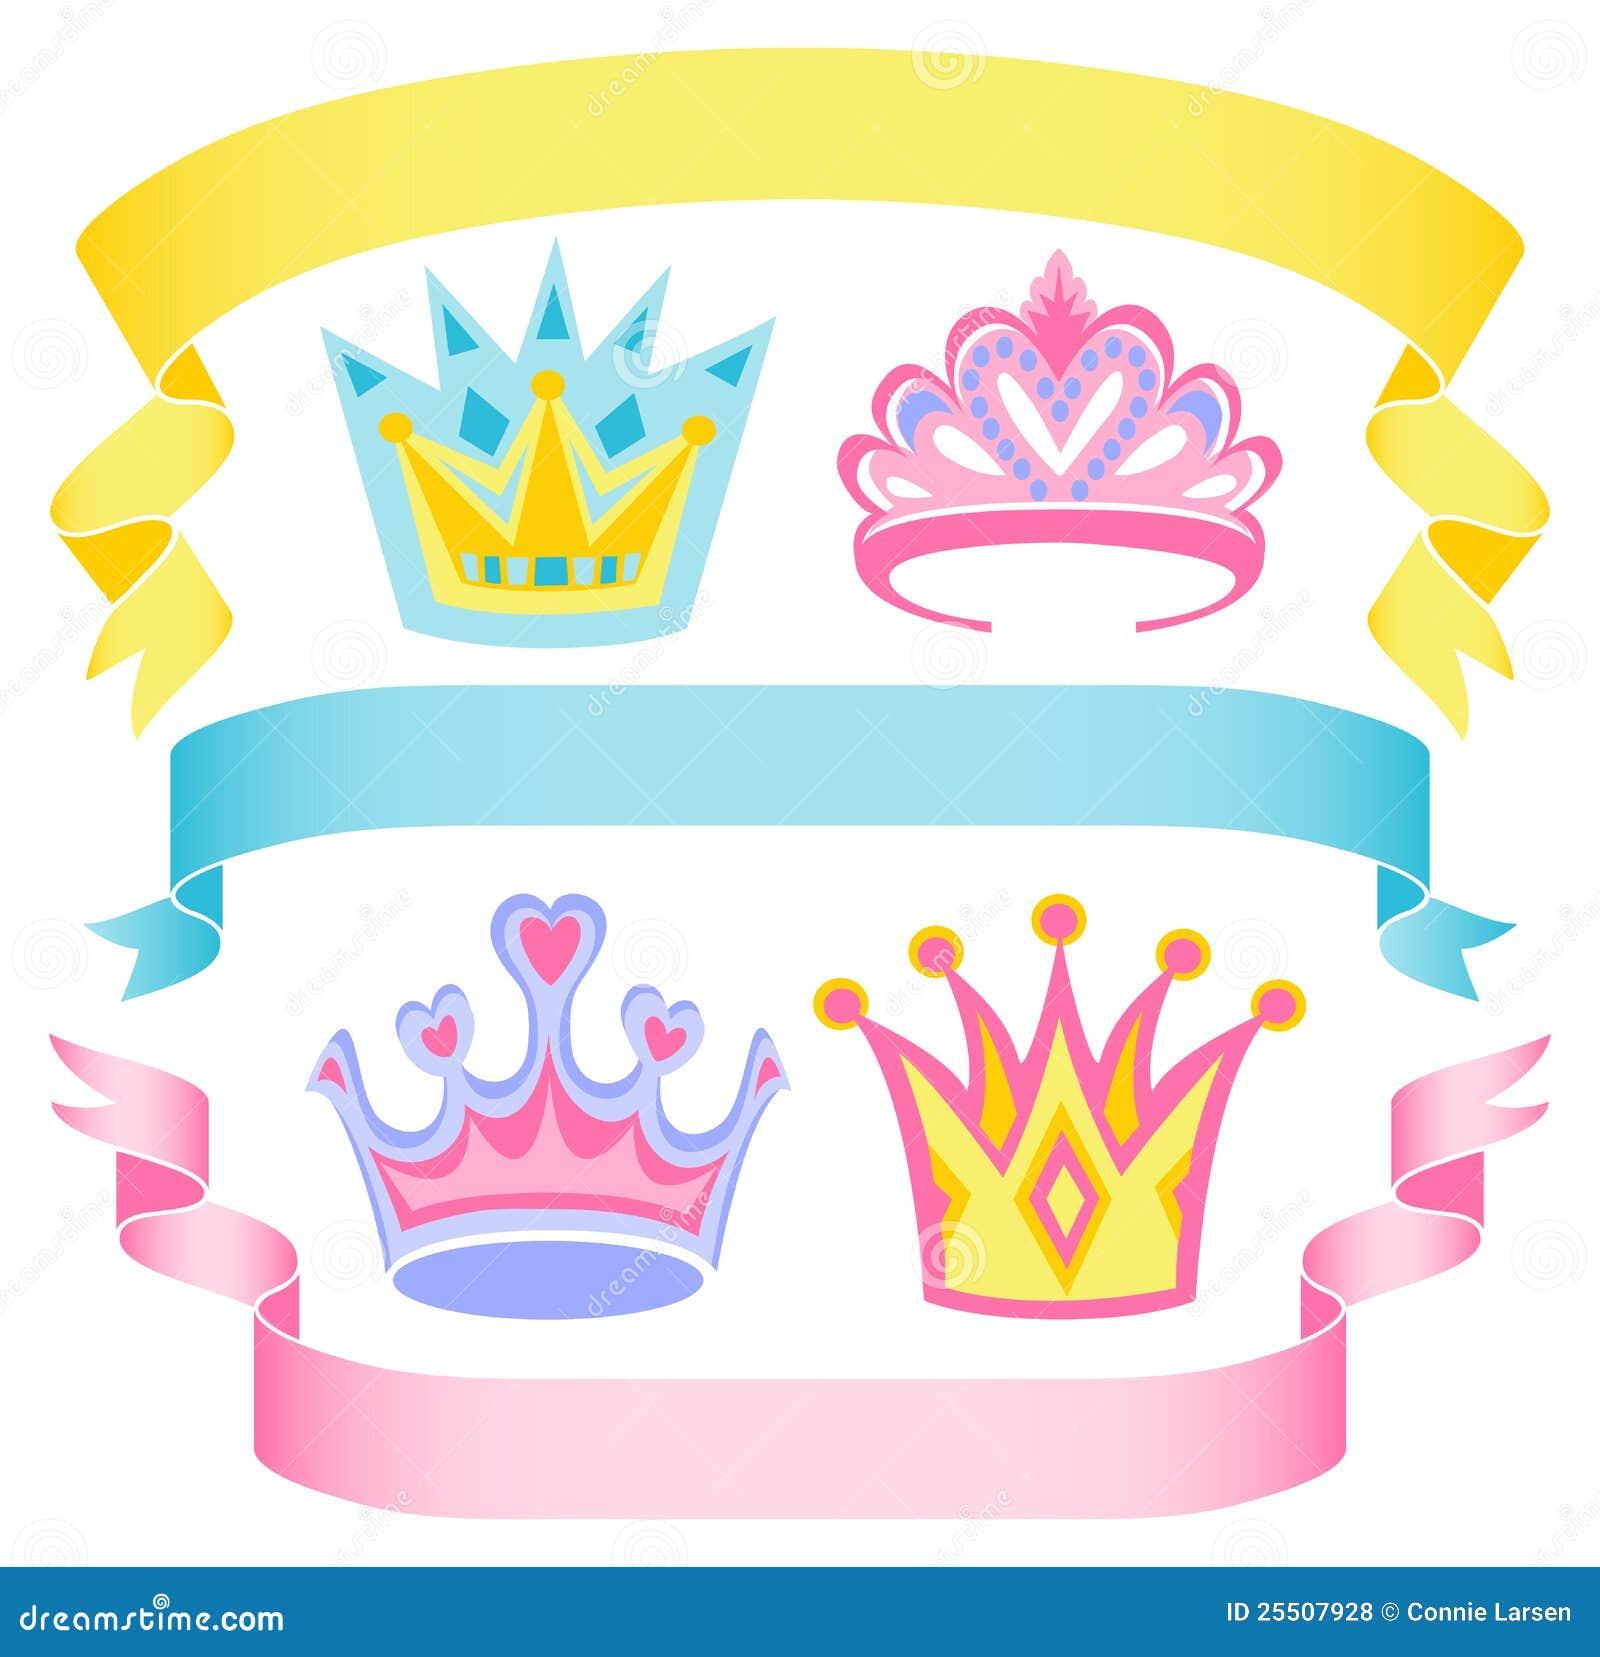 Prince crown clip art